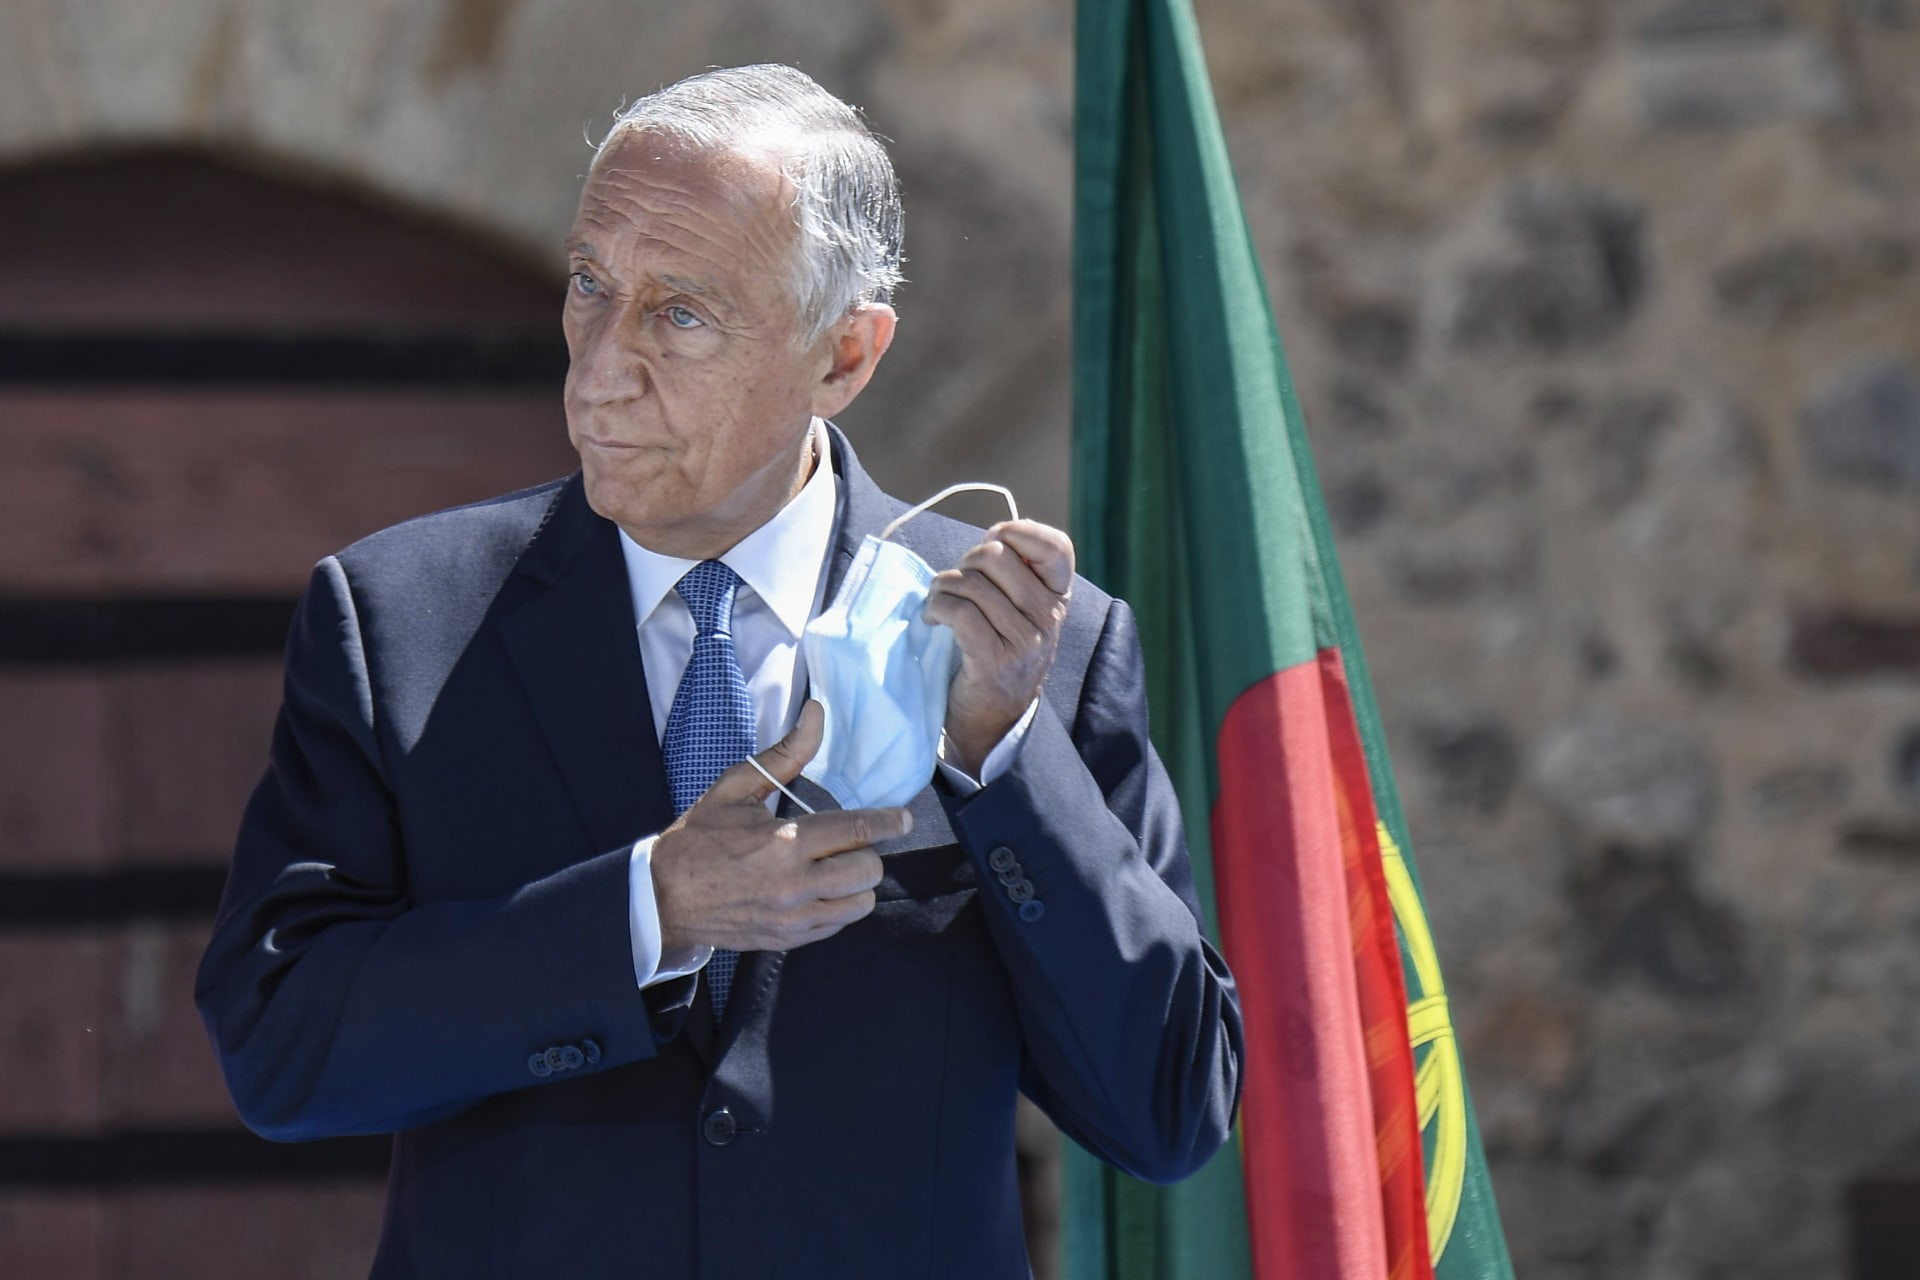 الرئيس البرتغالي مارسيلو ريبيلو دي سوزا